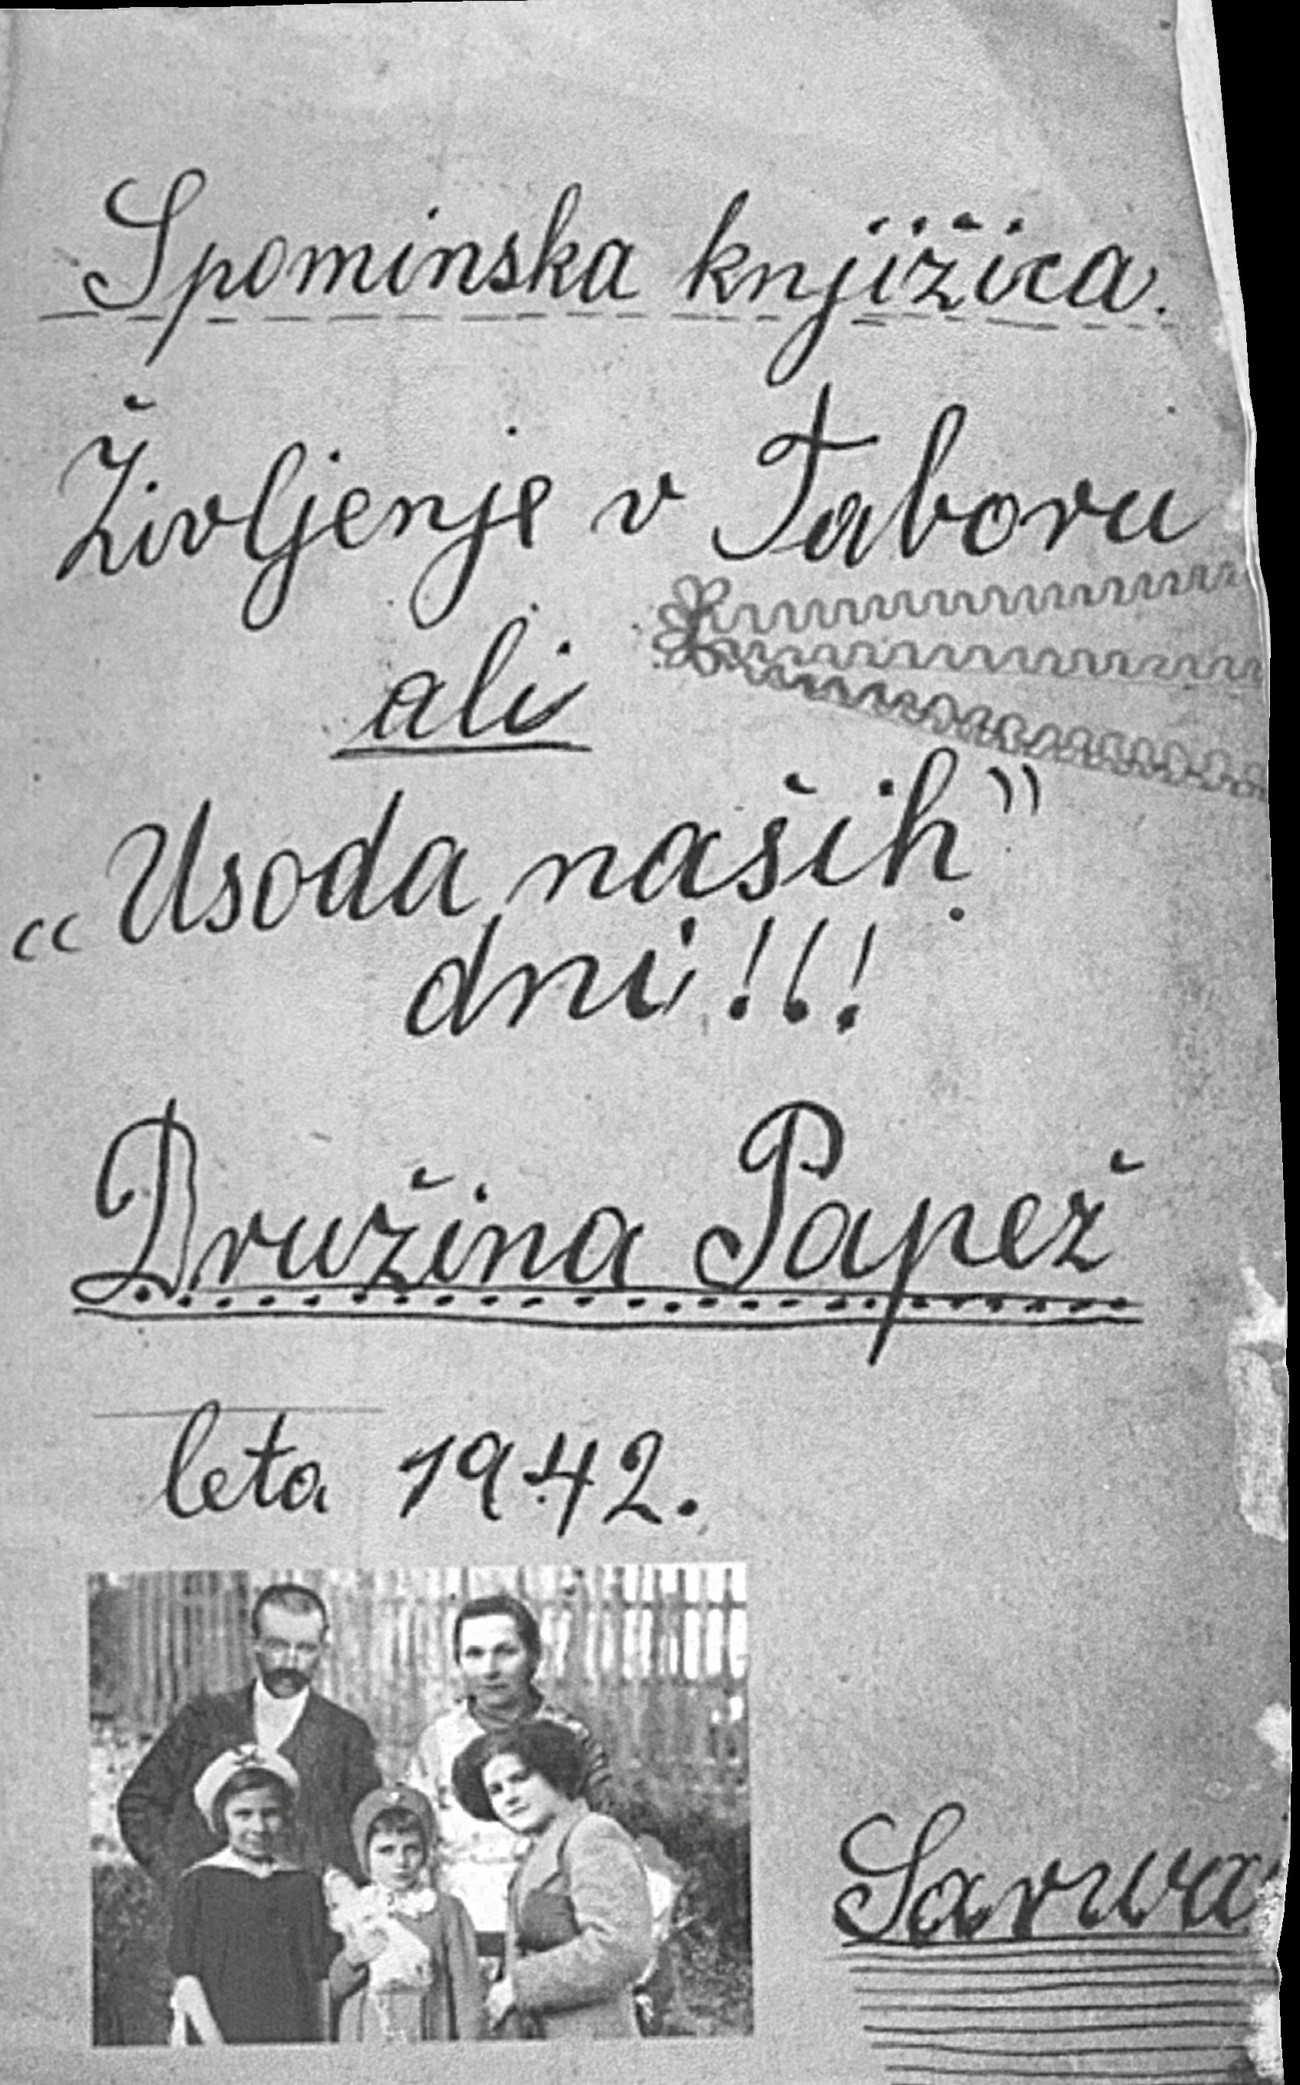 Naslovna stran spominske knjižice Primorke Agneze Papež, ki jo je pisala v taborišču Sárvár. Bensa, Usoda naših dni, 14.